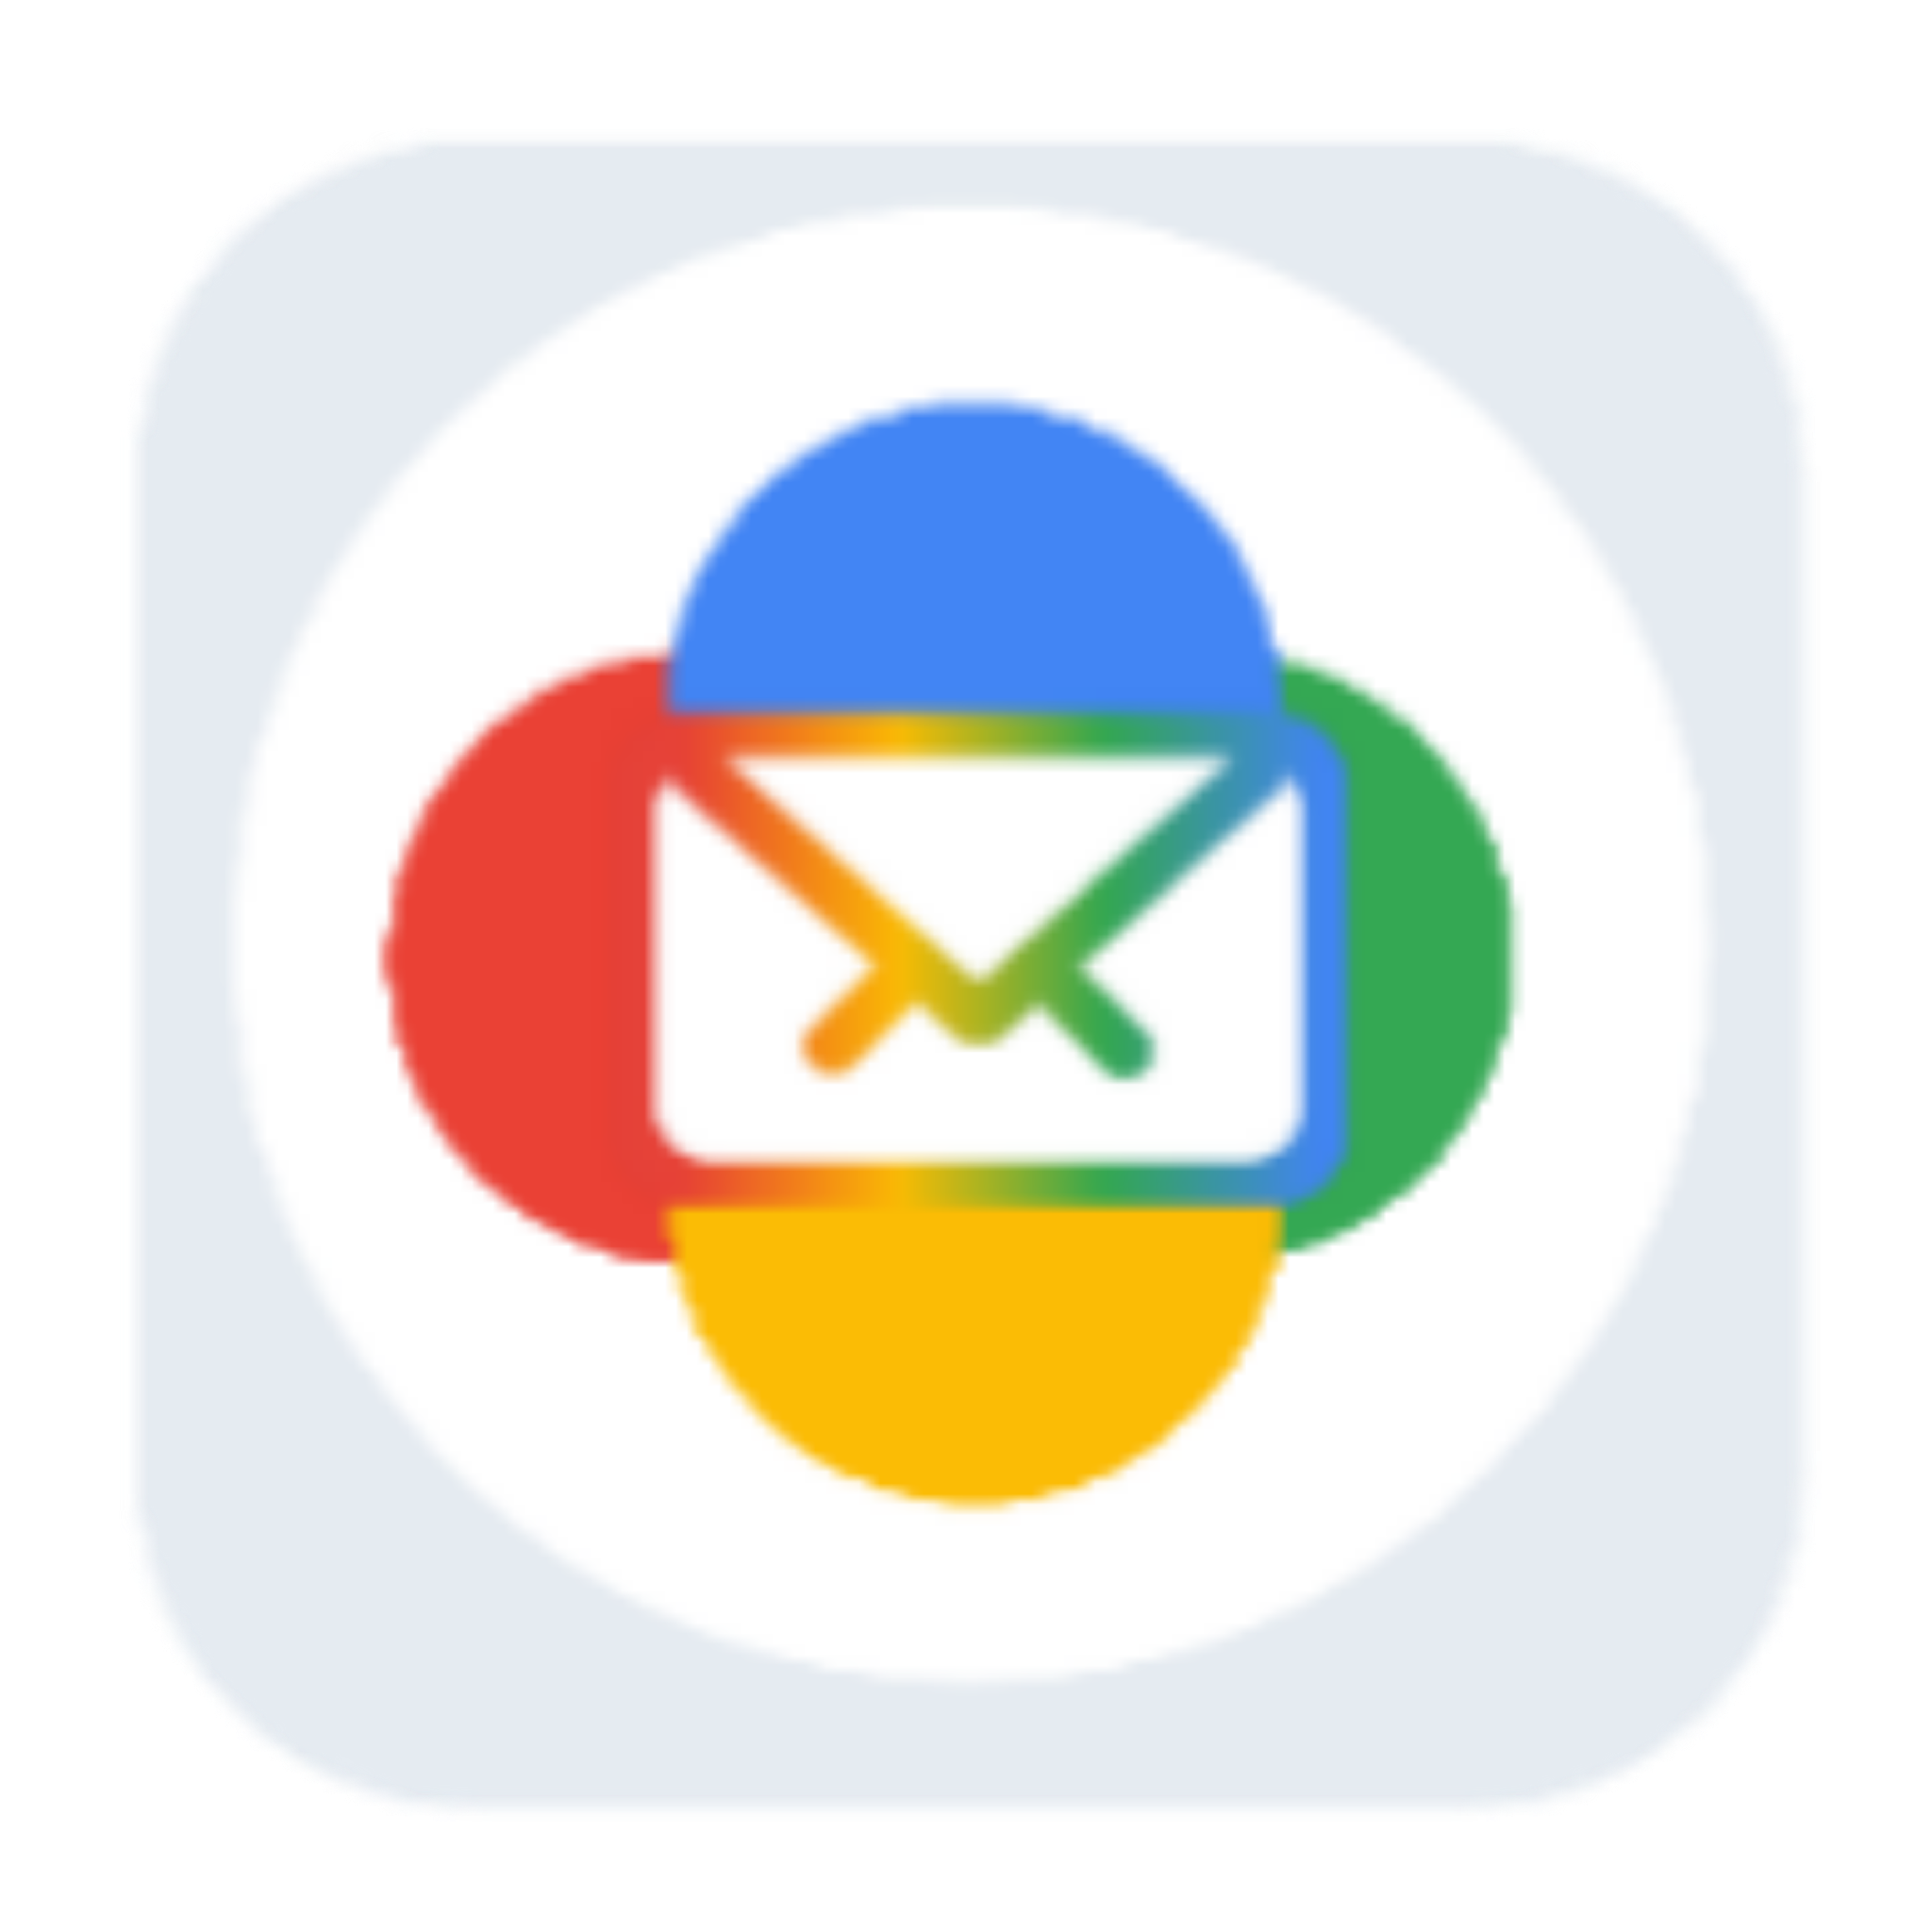 Best gmail logo redesign